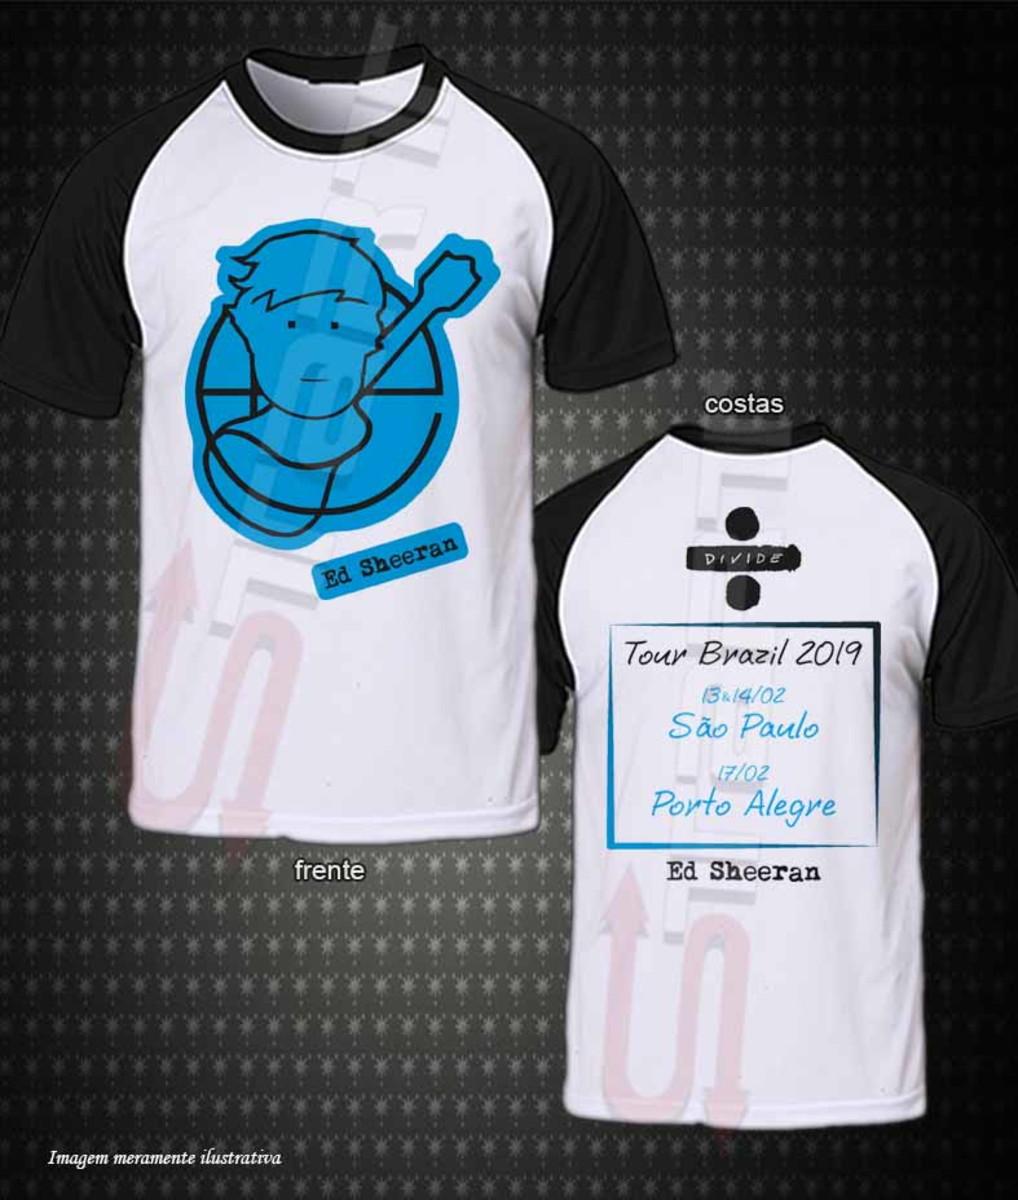 Camiseta Raglan Ed Sheeran Tour Brazil 2019 no Elo7  f50cda5fbc0